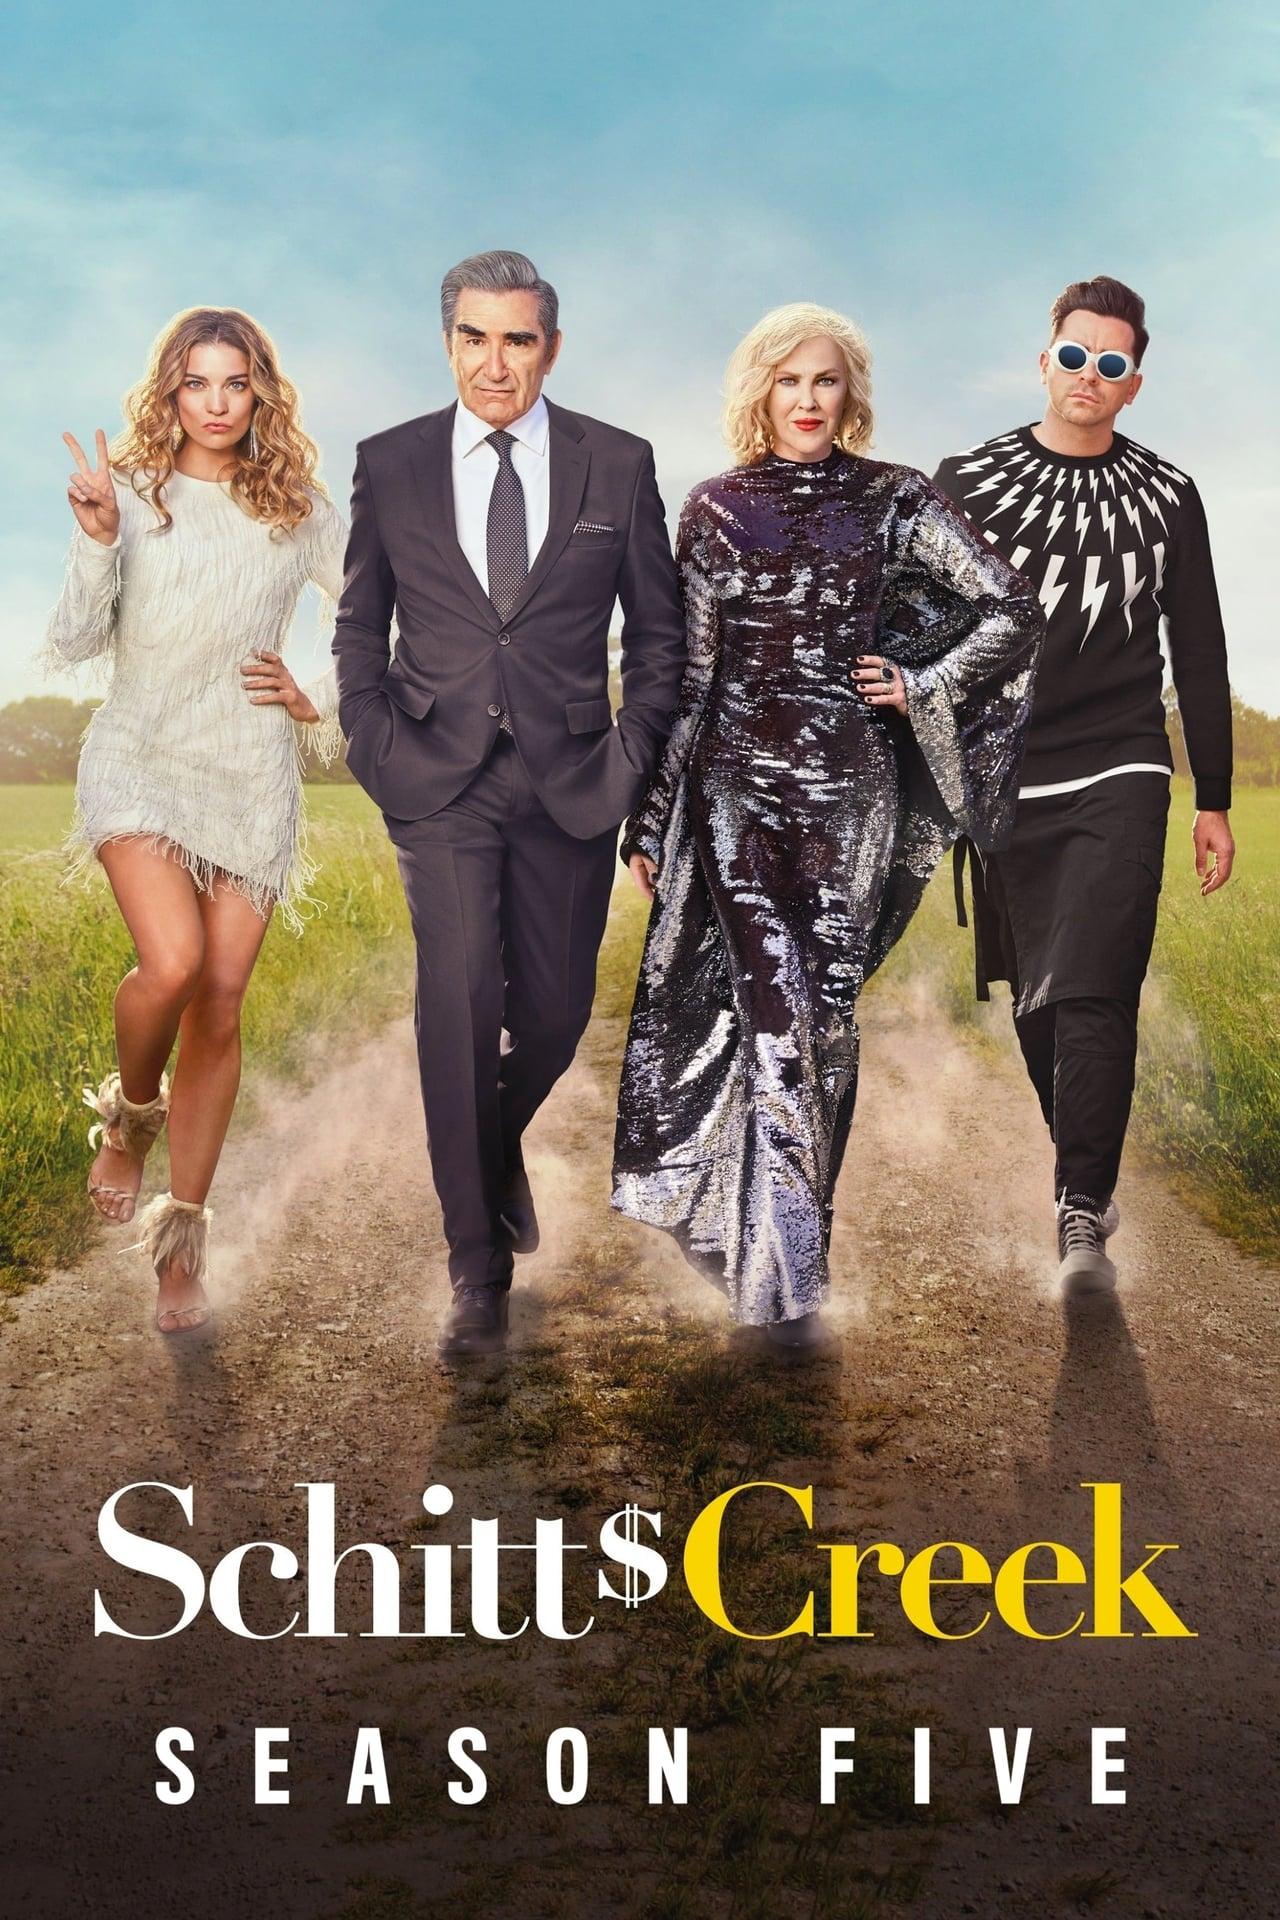 Schitt's Creek Season 5